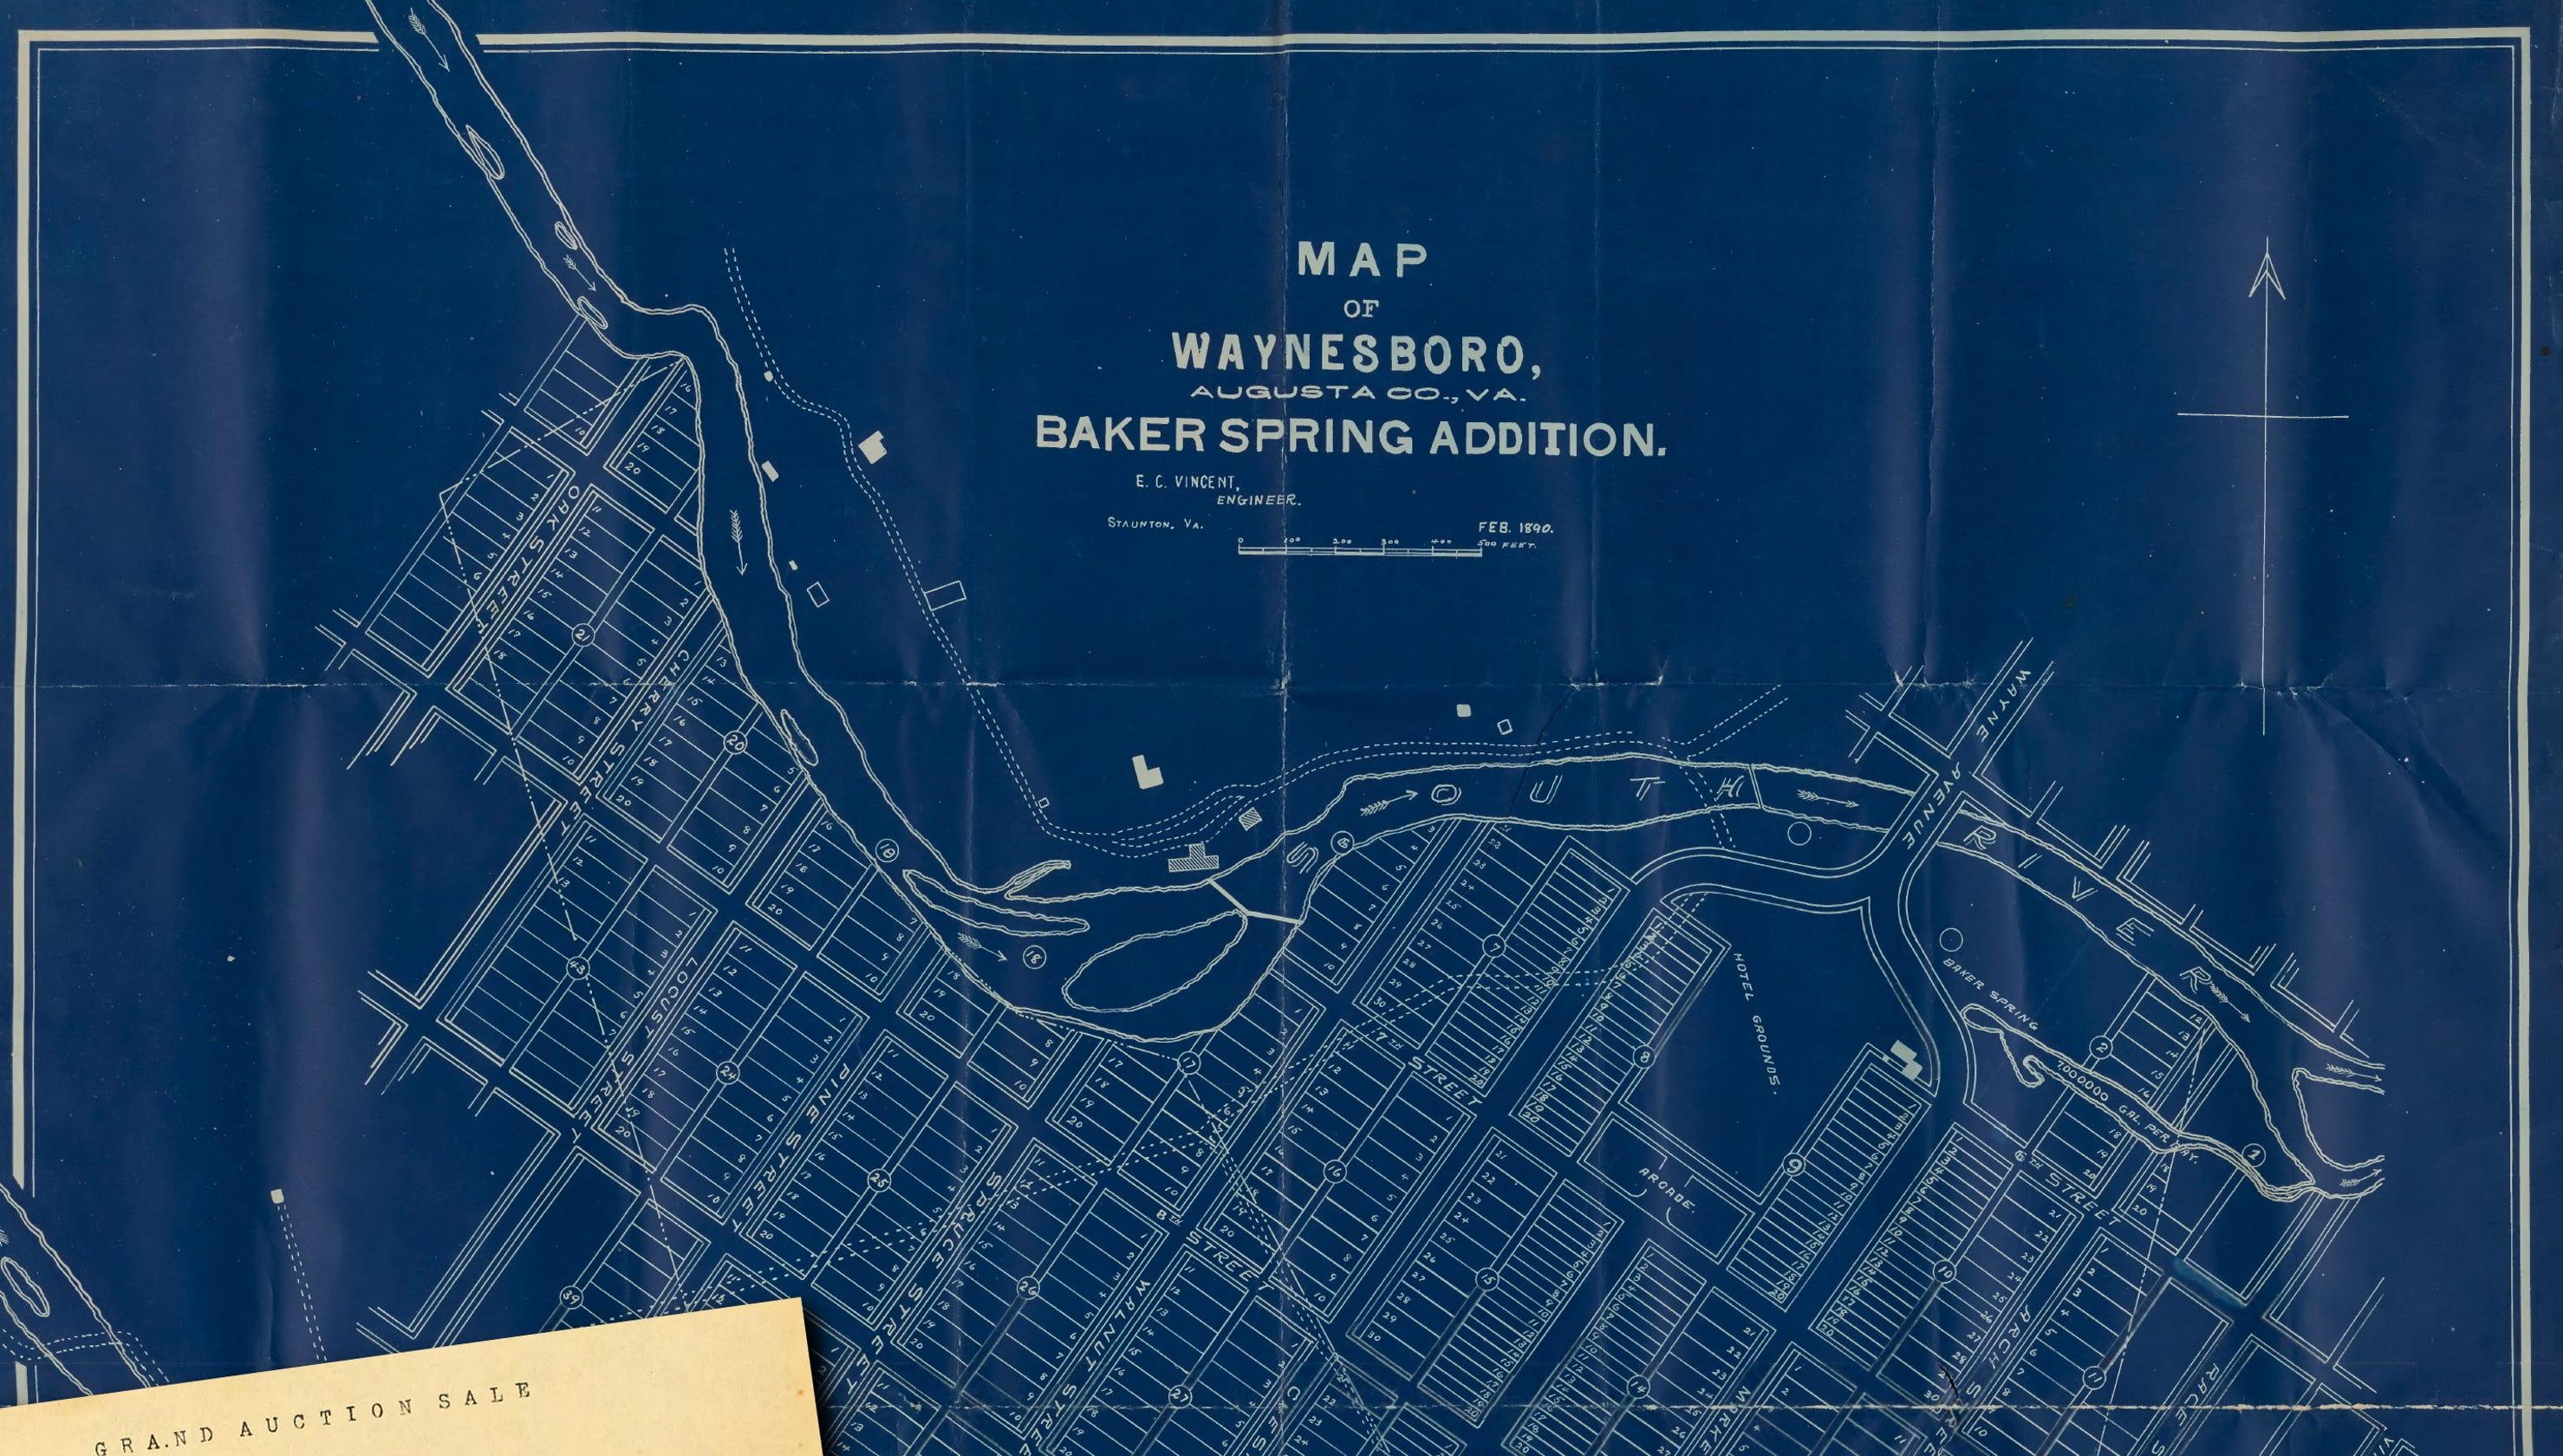 Baker Springs was the city that never happened: Waynesboro